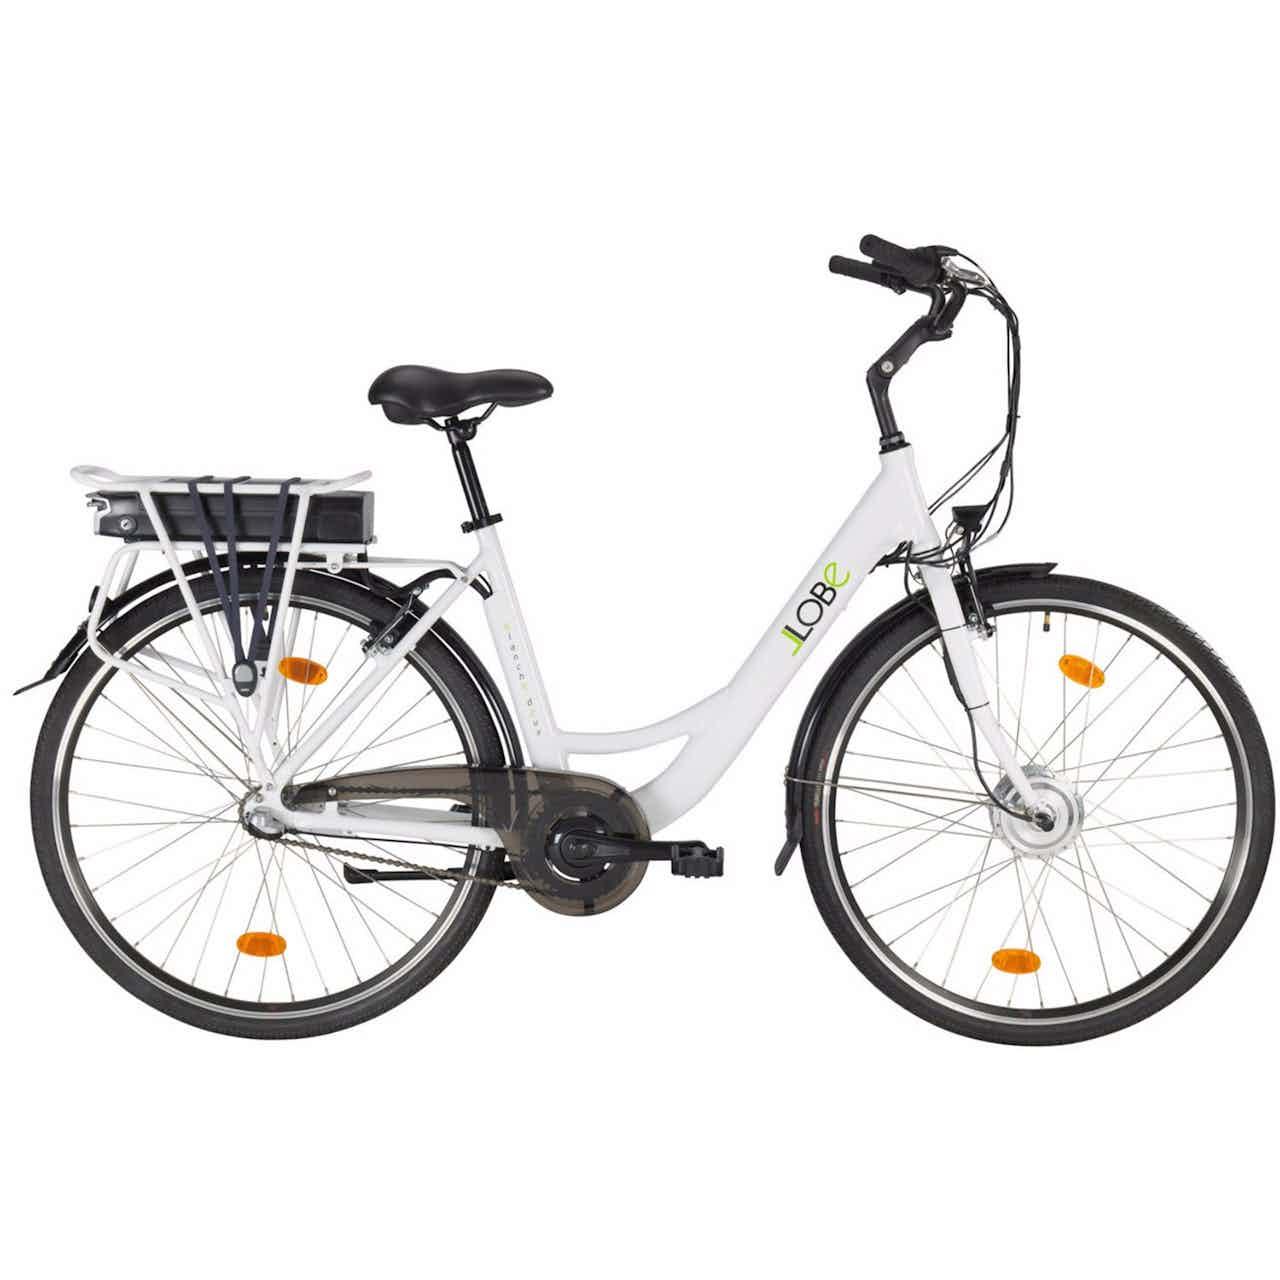 "Llobe E-Bike Damen City-Rad 28"" Blanche Deux Weiß"